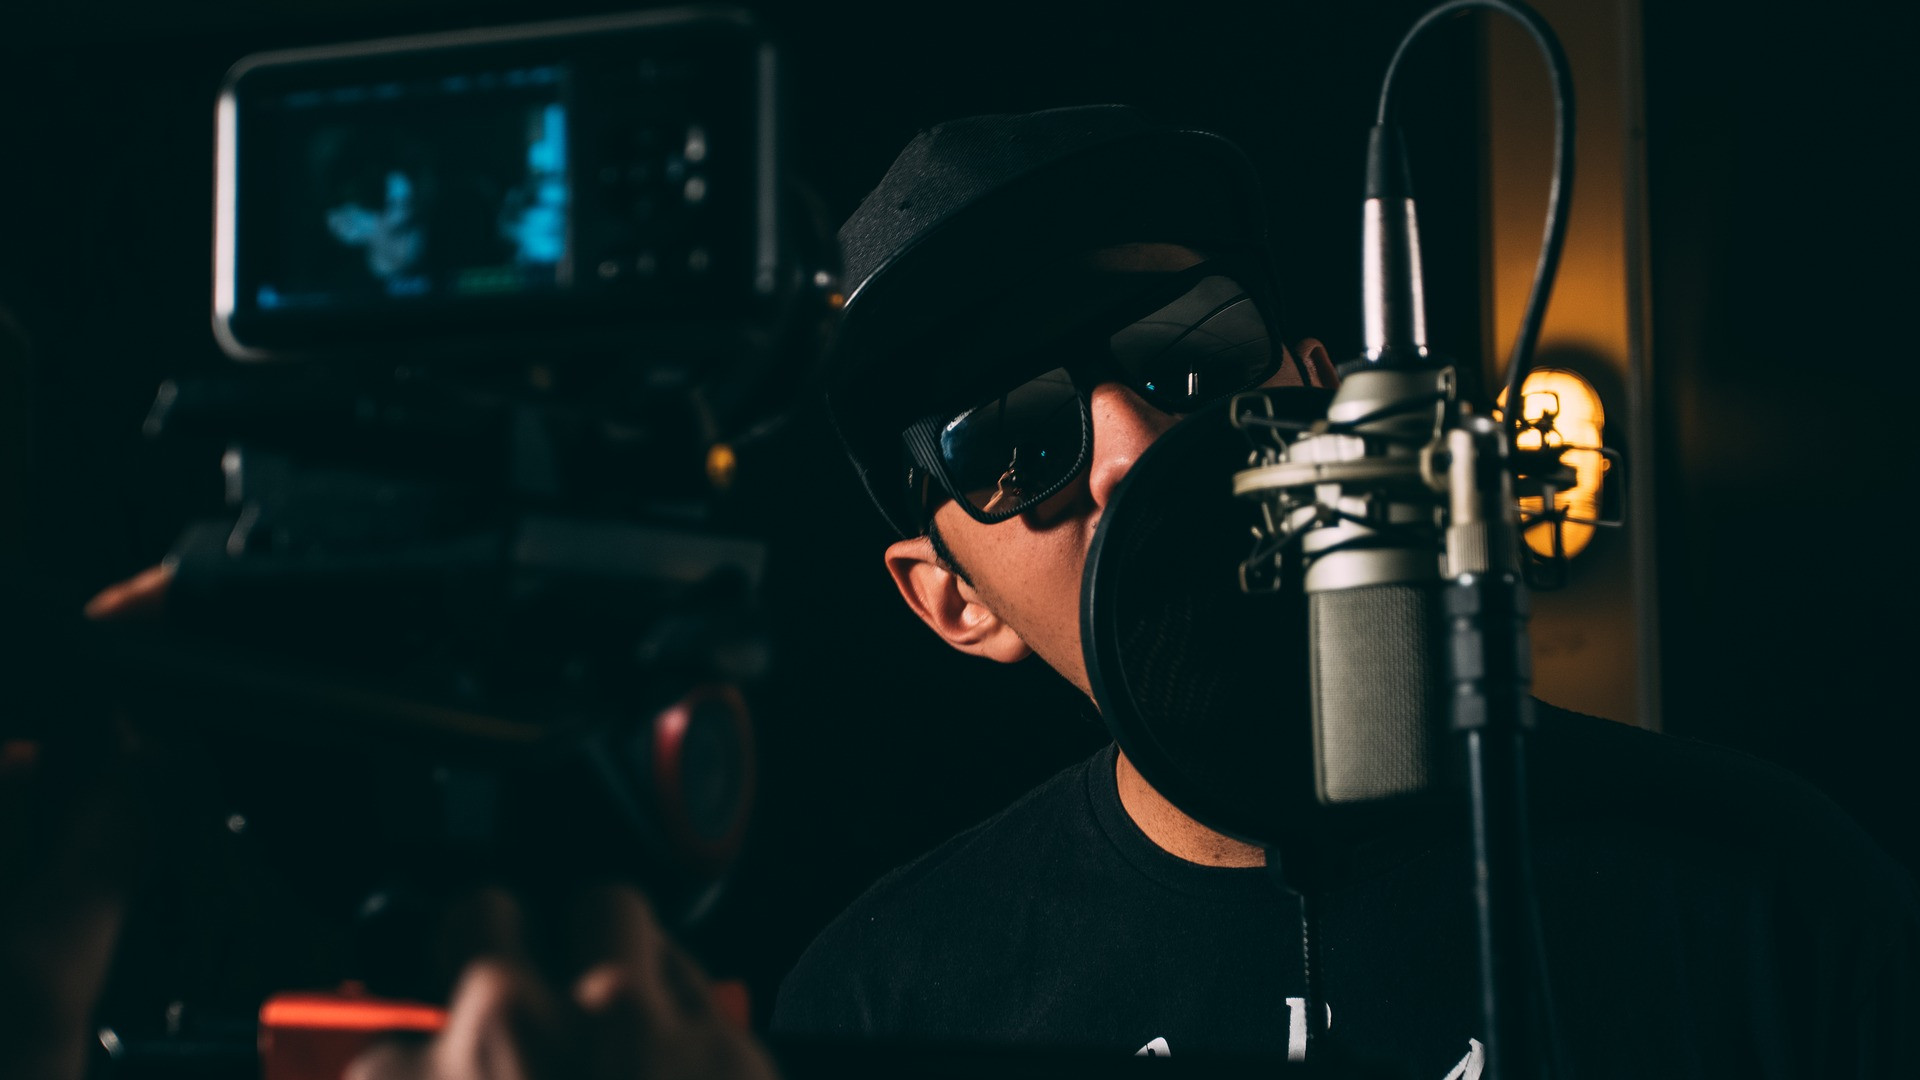 autorap-aplicacion-inclinada-hip-hop